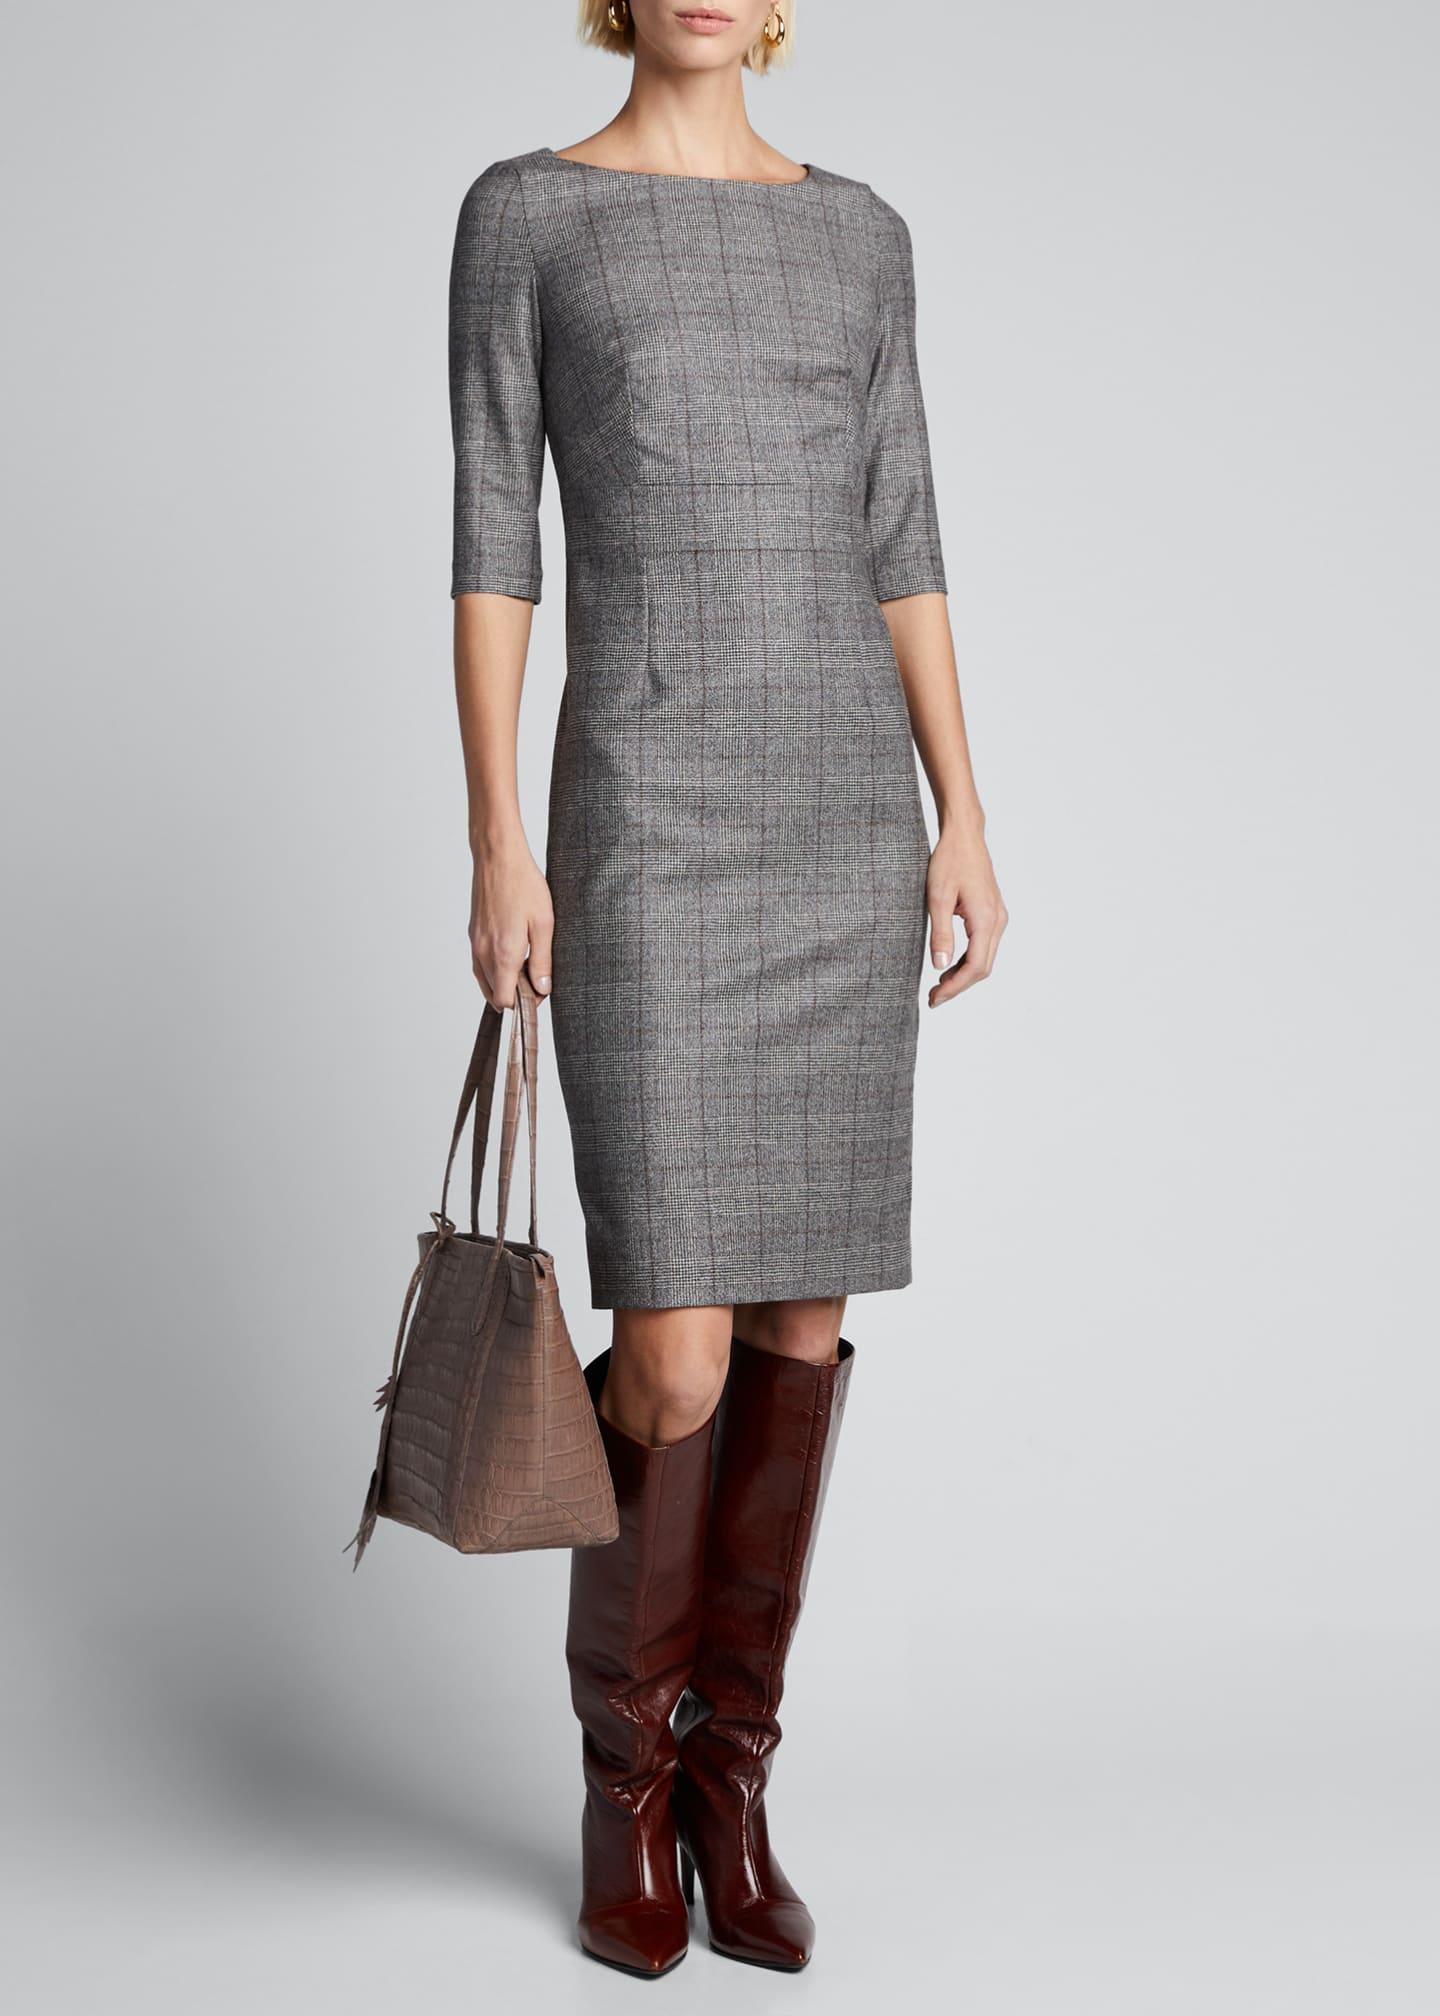 Kiton Half-Sleeve Check Dress